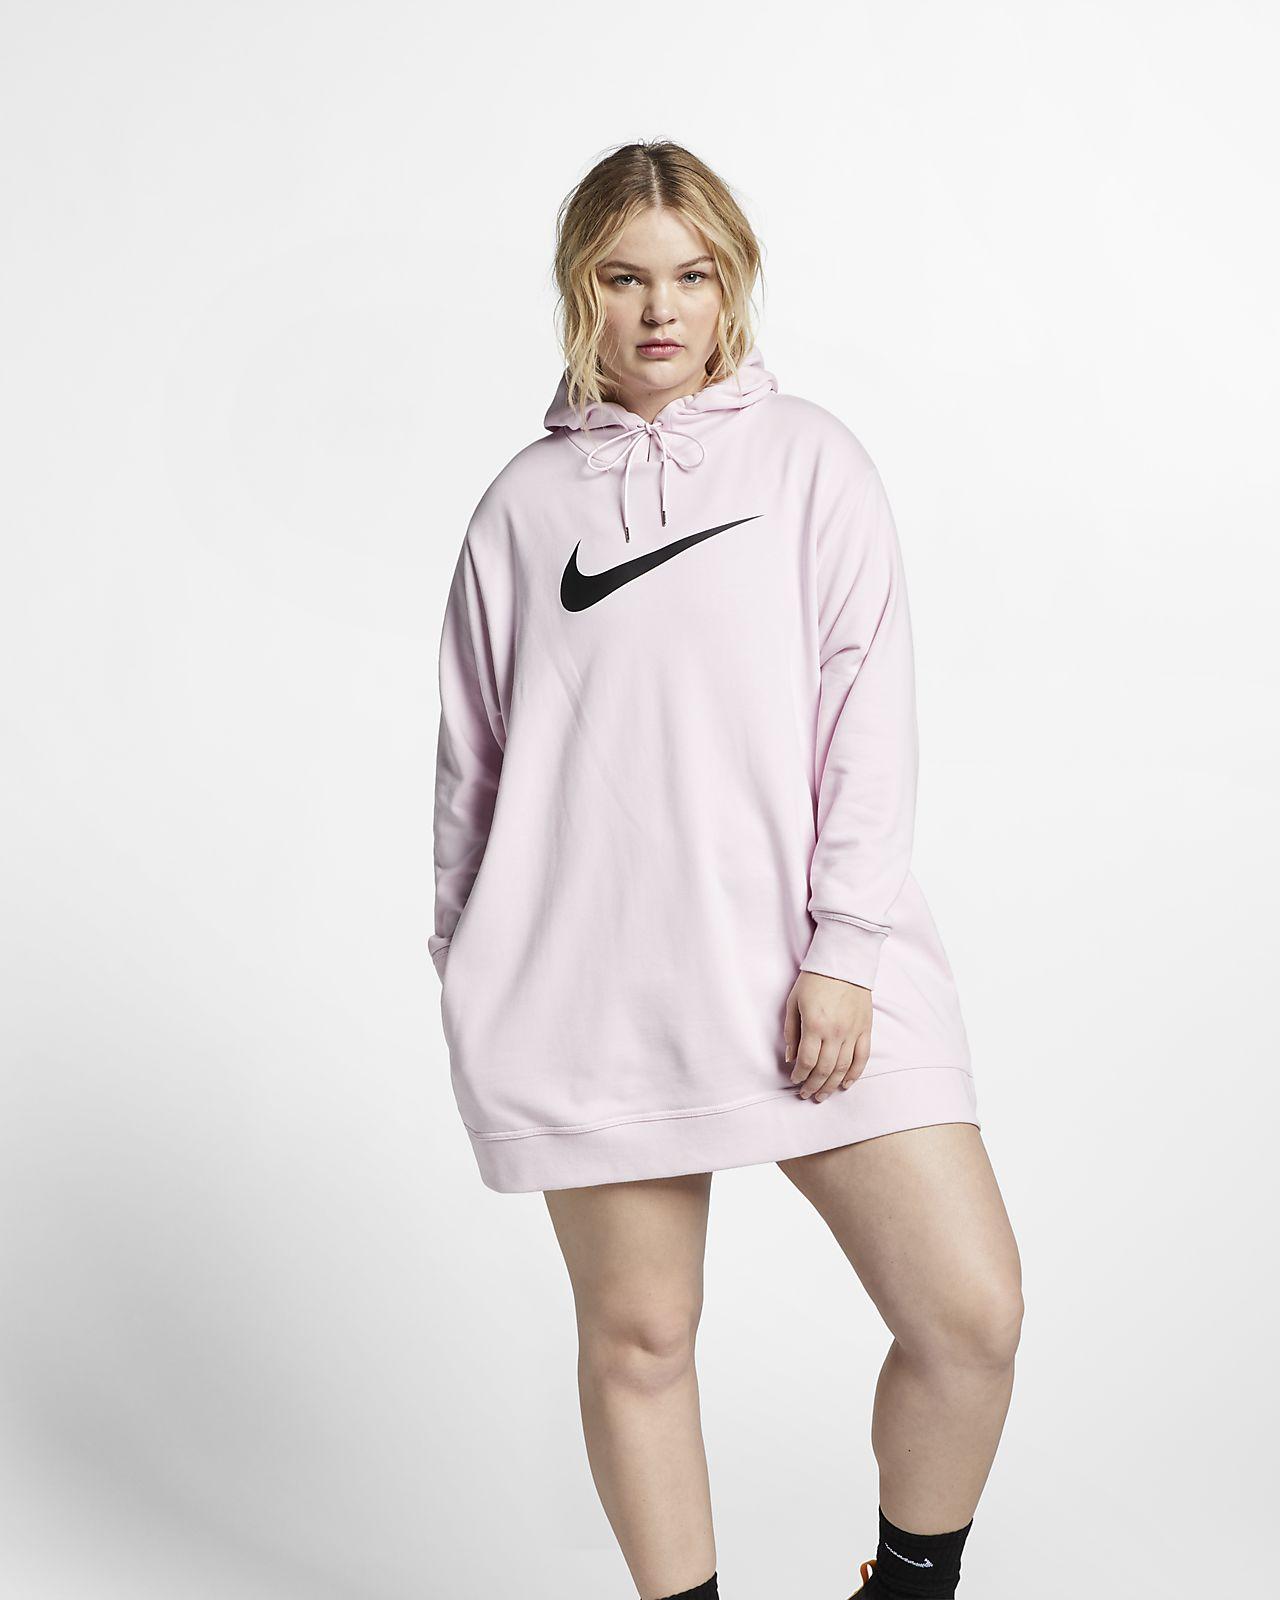 Francesa Mujer Grande De Felpa talla Vestido Sportswear Para Nike 17wvESq